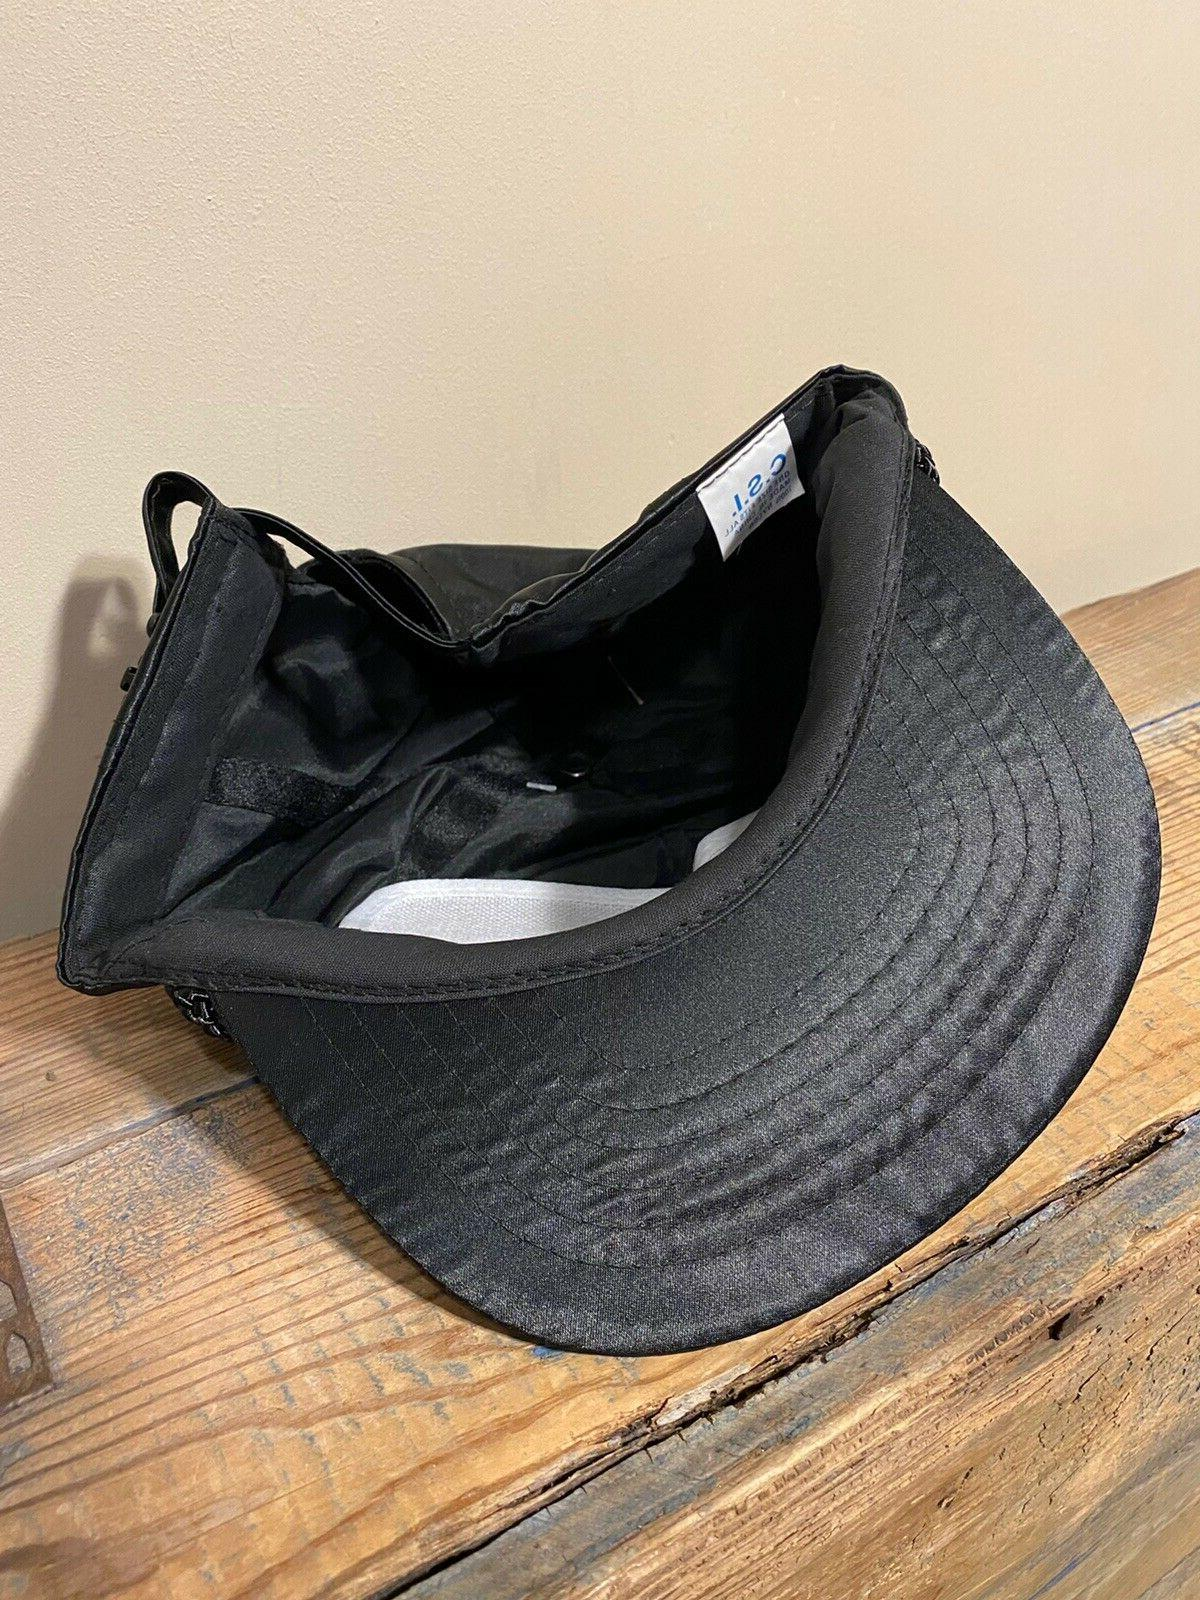 Vintage Francisco Nylon Satin Hat Adjustable Black NOS